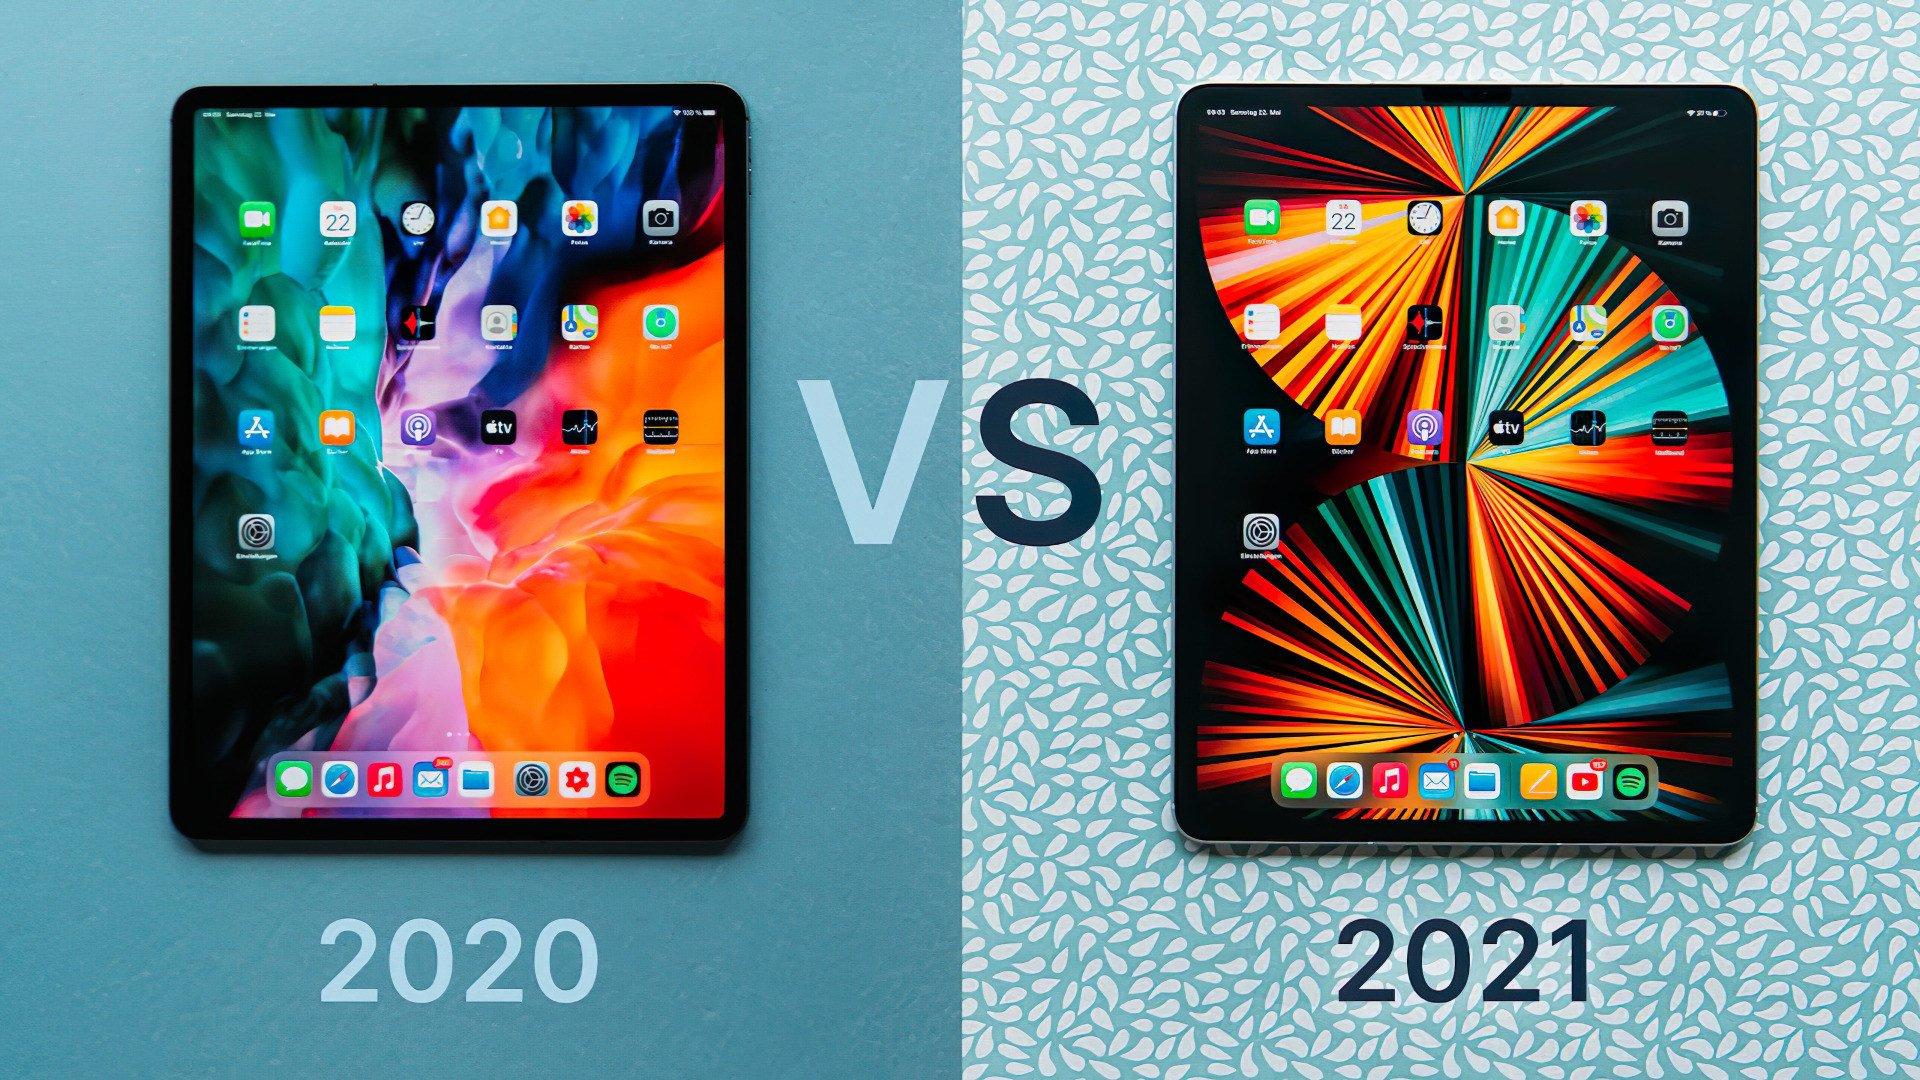 Apple, Tablet, Ipad, Apple Ipad, ipad pro, Vergleich, M1, M1 Chip, Jonas Kaniuth, TechnikFreundYT, iPad Pro 2020, Apple iPad Pro 2020, iPad Pro 2021, M1-Chip, M1 CPU, Apple iPad Pro 2021